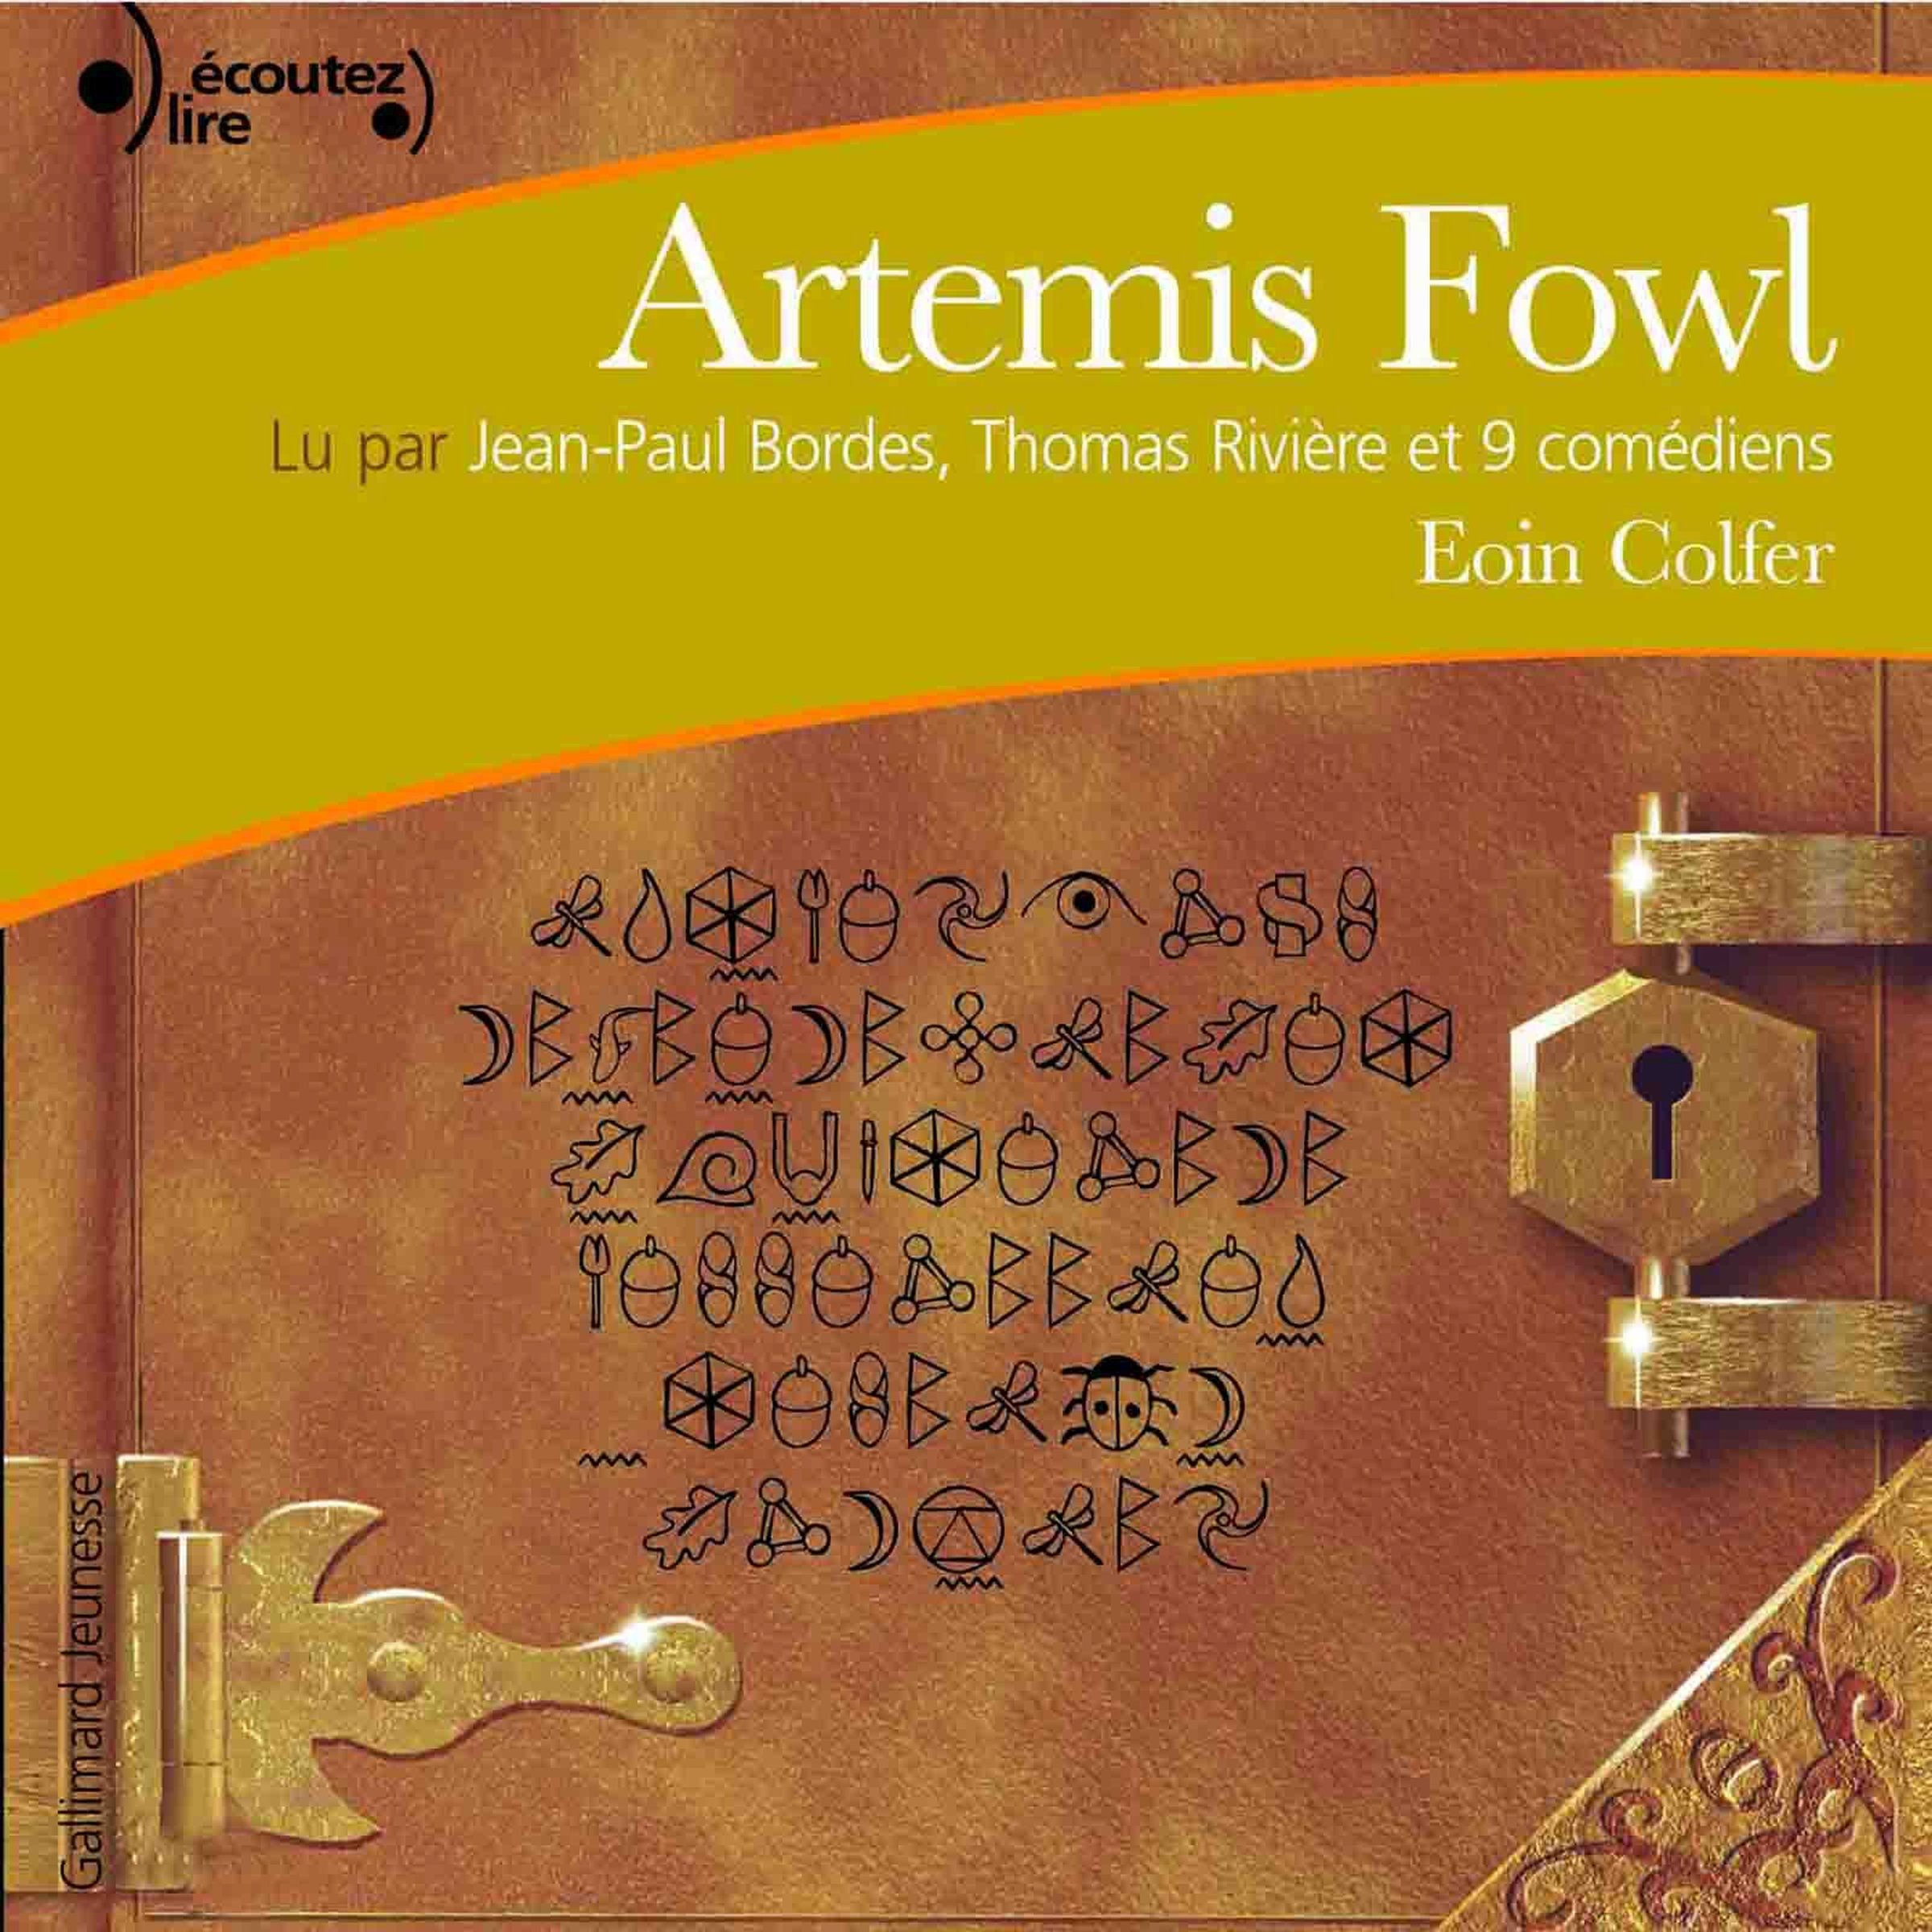 Artemis Fowl: Artemis Fowl 1